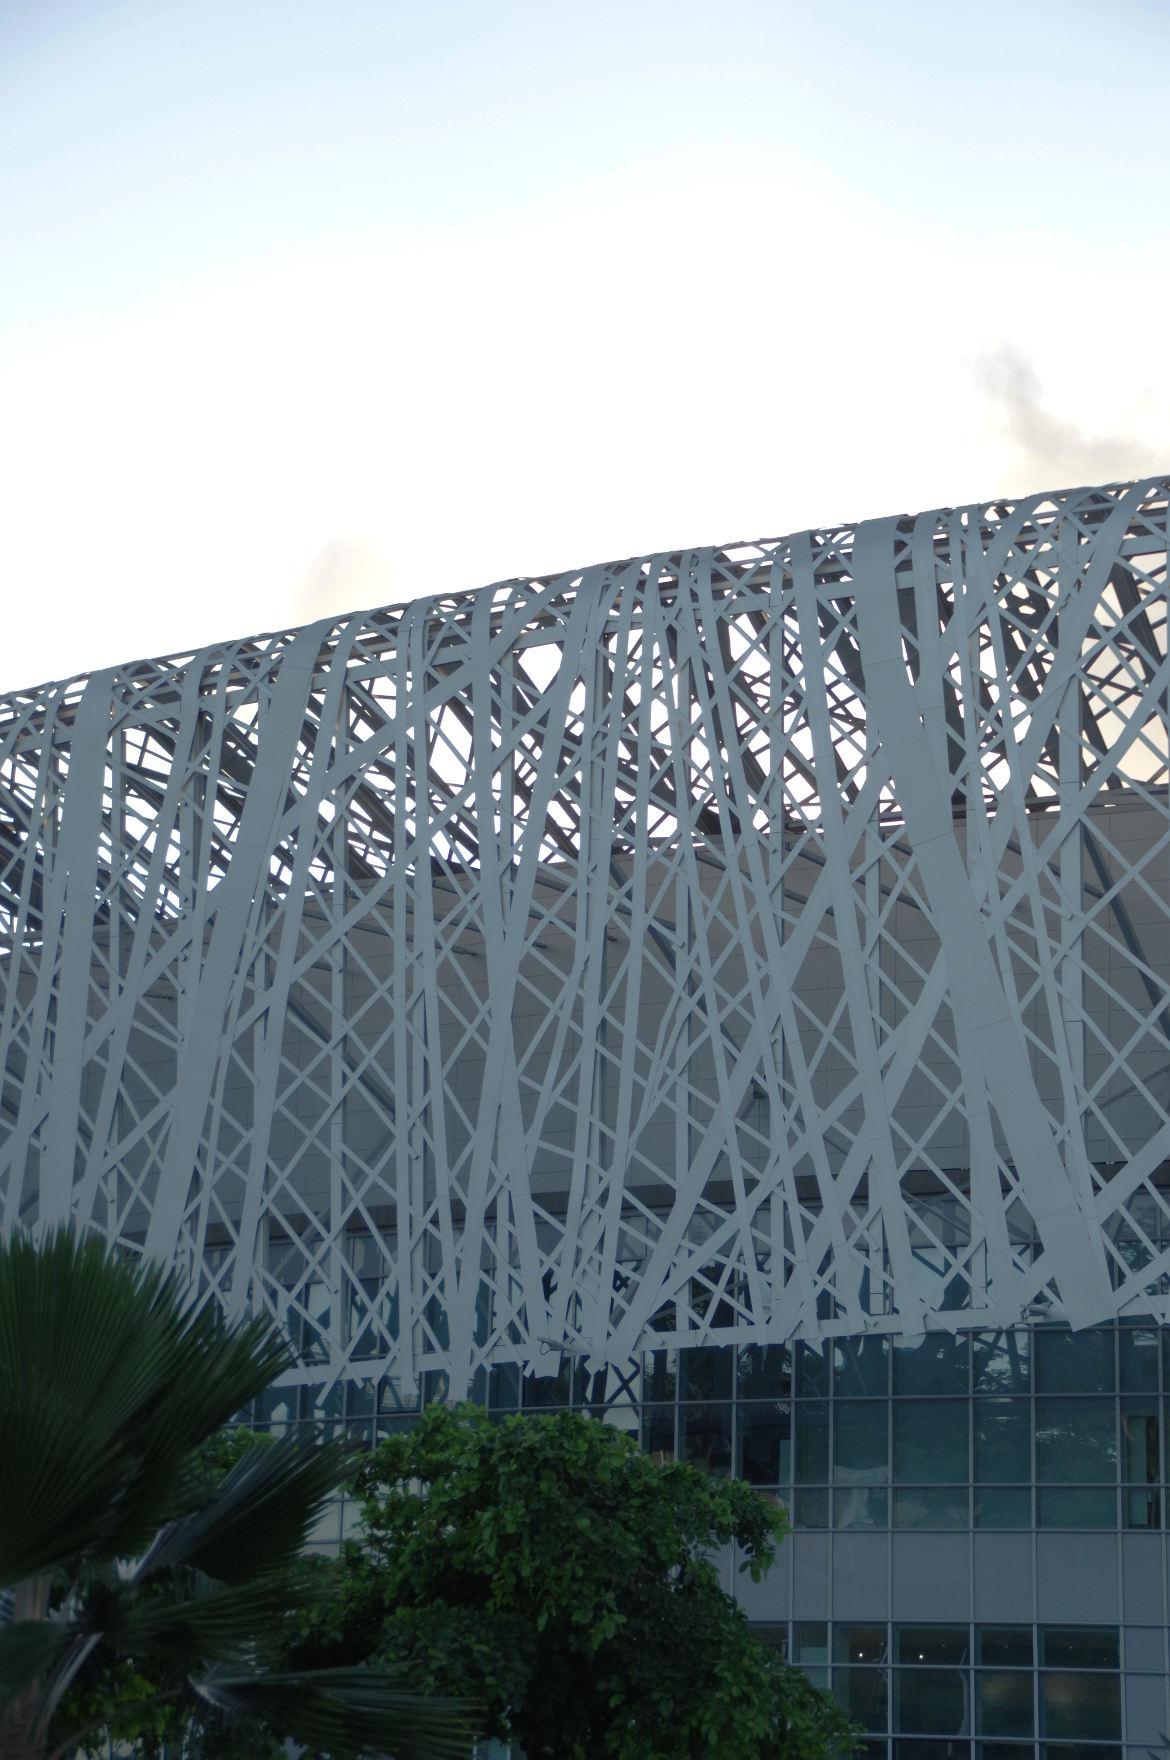 L'architecture du memorial acte